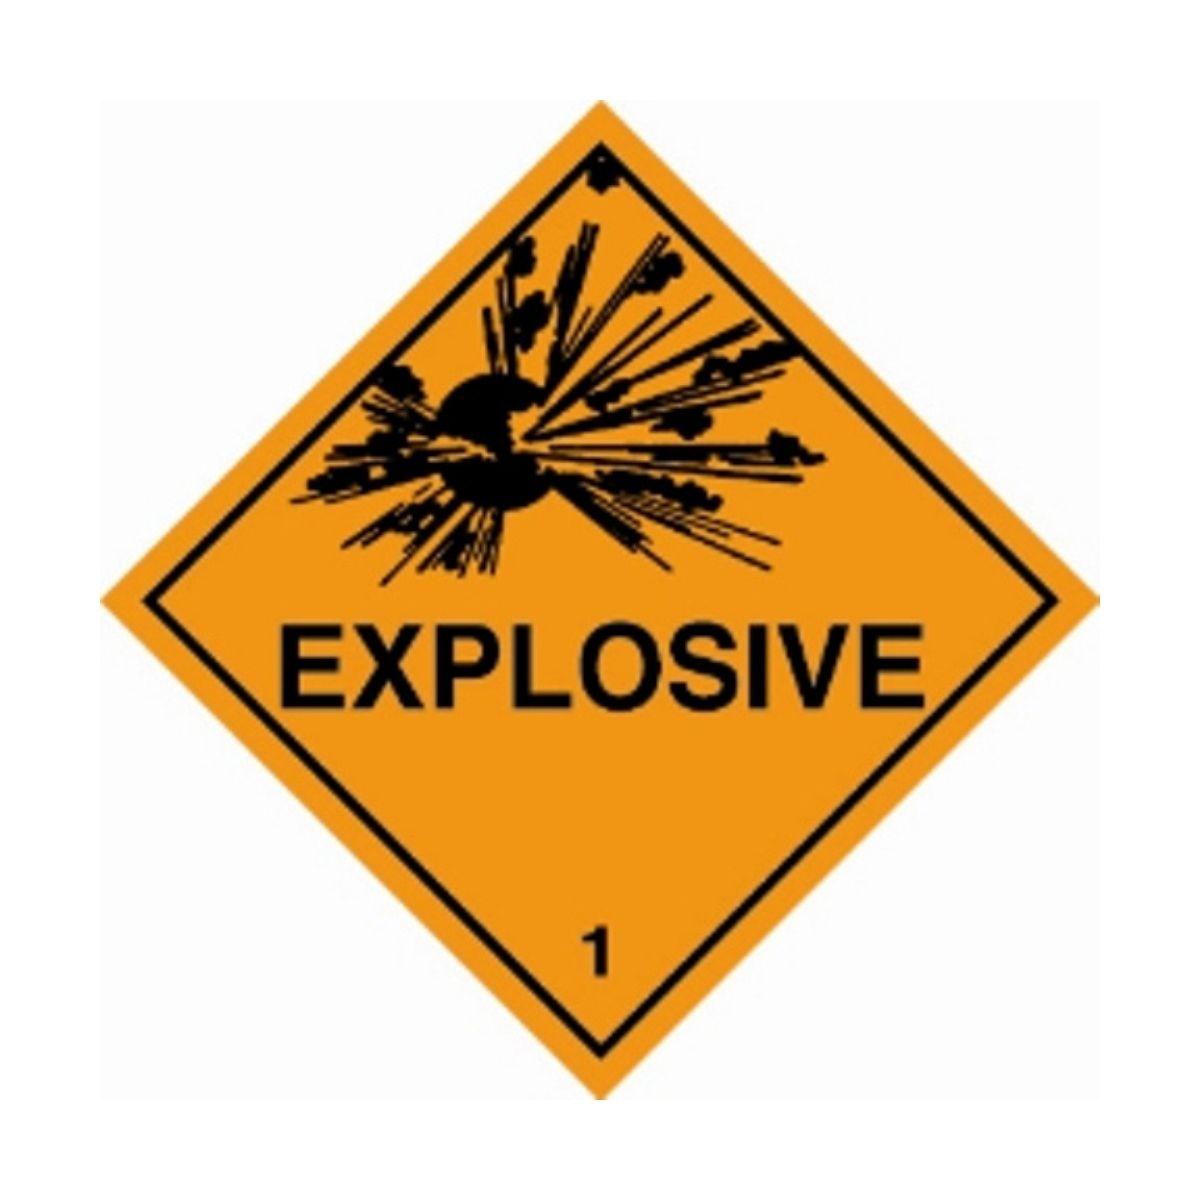 HD1101 UN Hazard Warning Diamond Class 1 Explosive